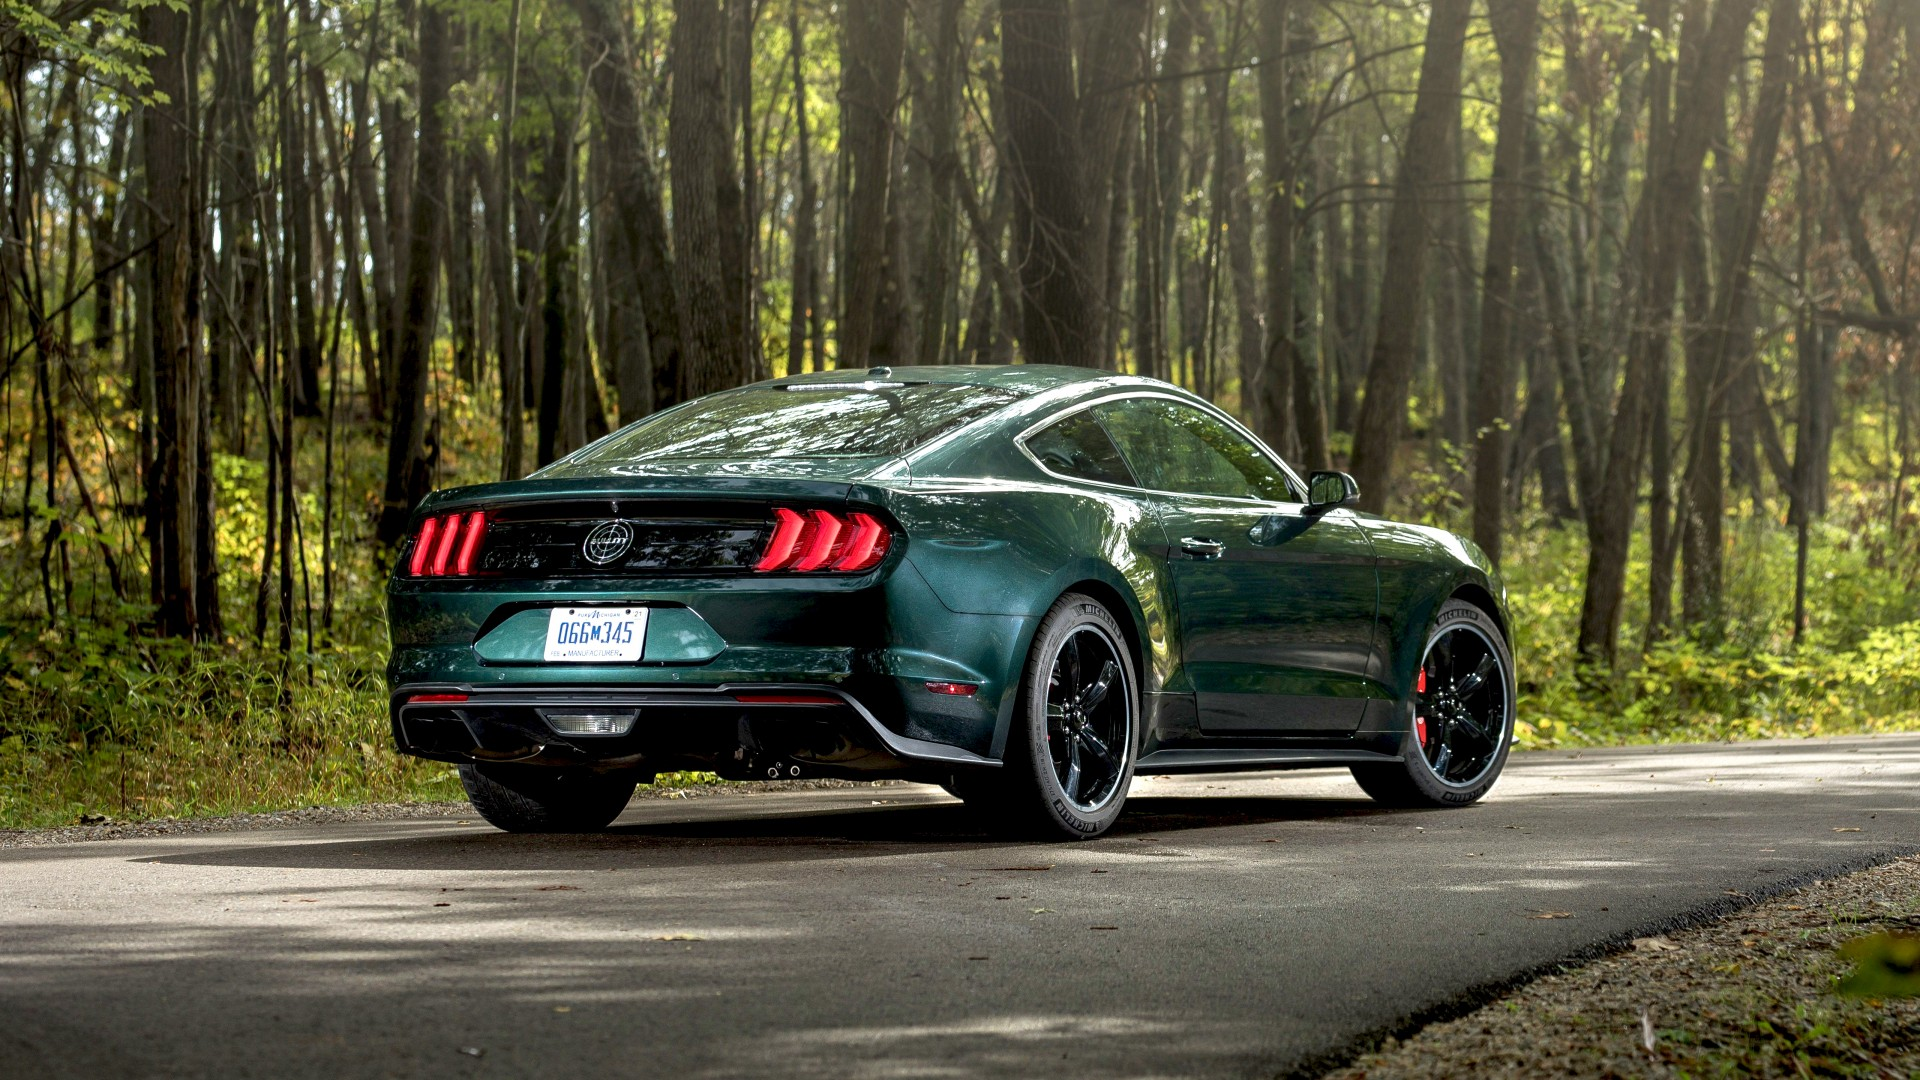 Mustang Mach 2 >> 2019 Ford Mustang Bullitt 5K 2 Wallpaper | HD Car Wallpapers | ID #12556